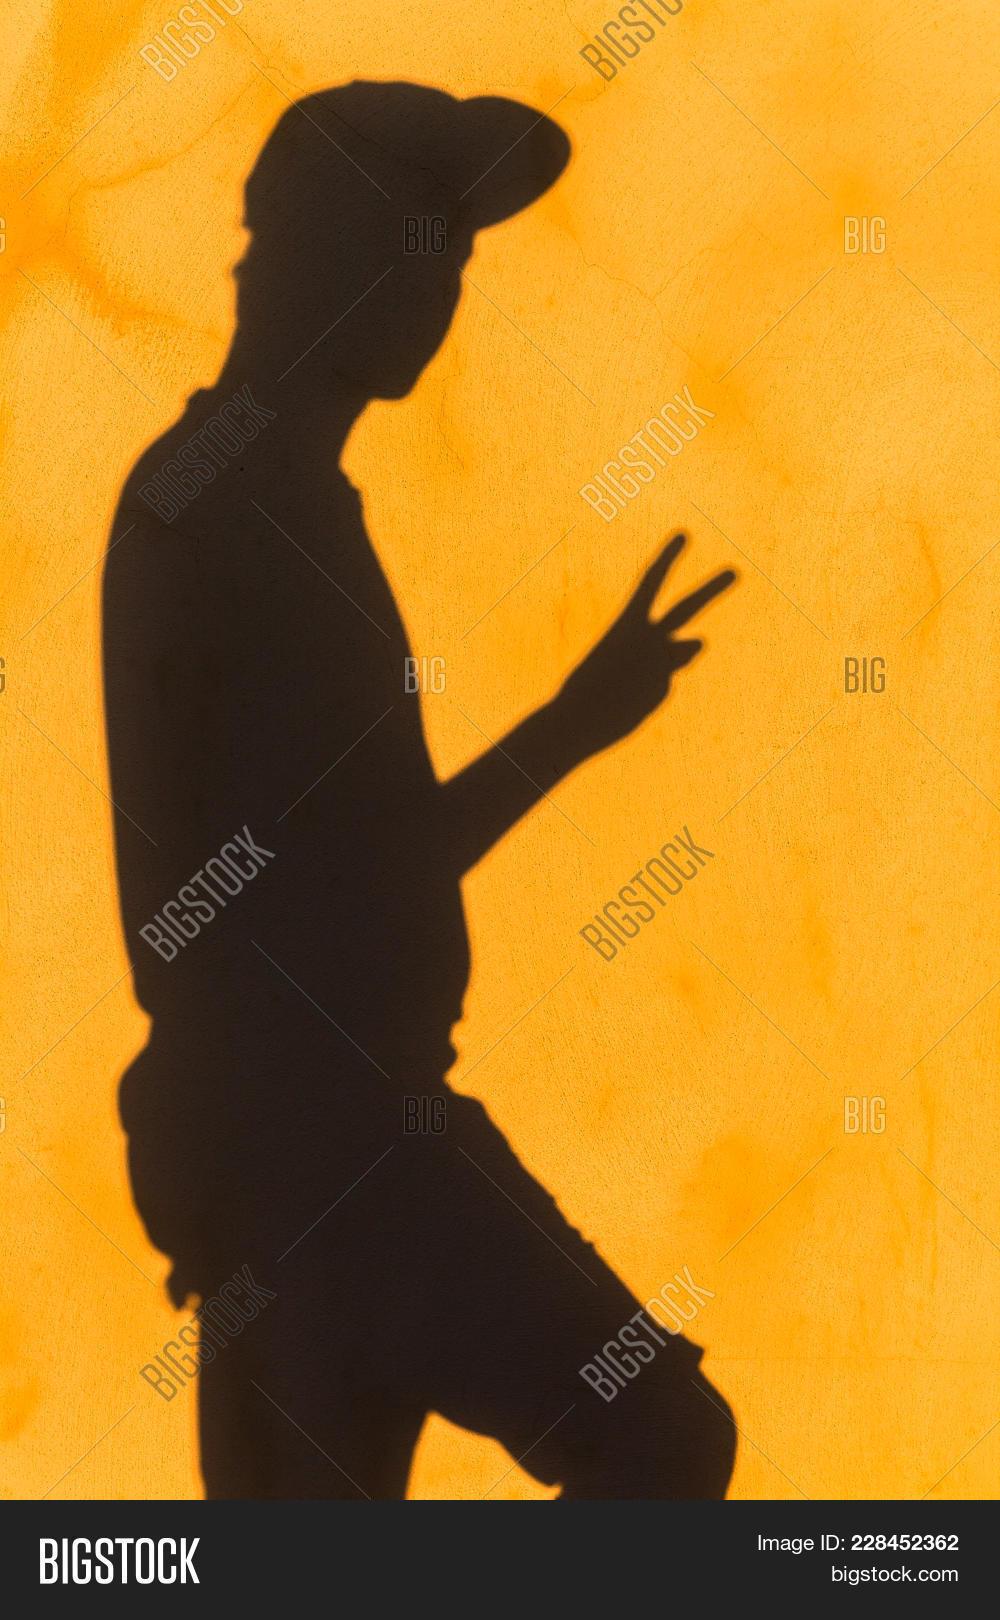 Teenager Shadow Wall Image & Photo (Free Trial) | Bigstock